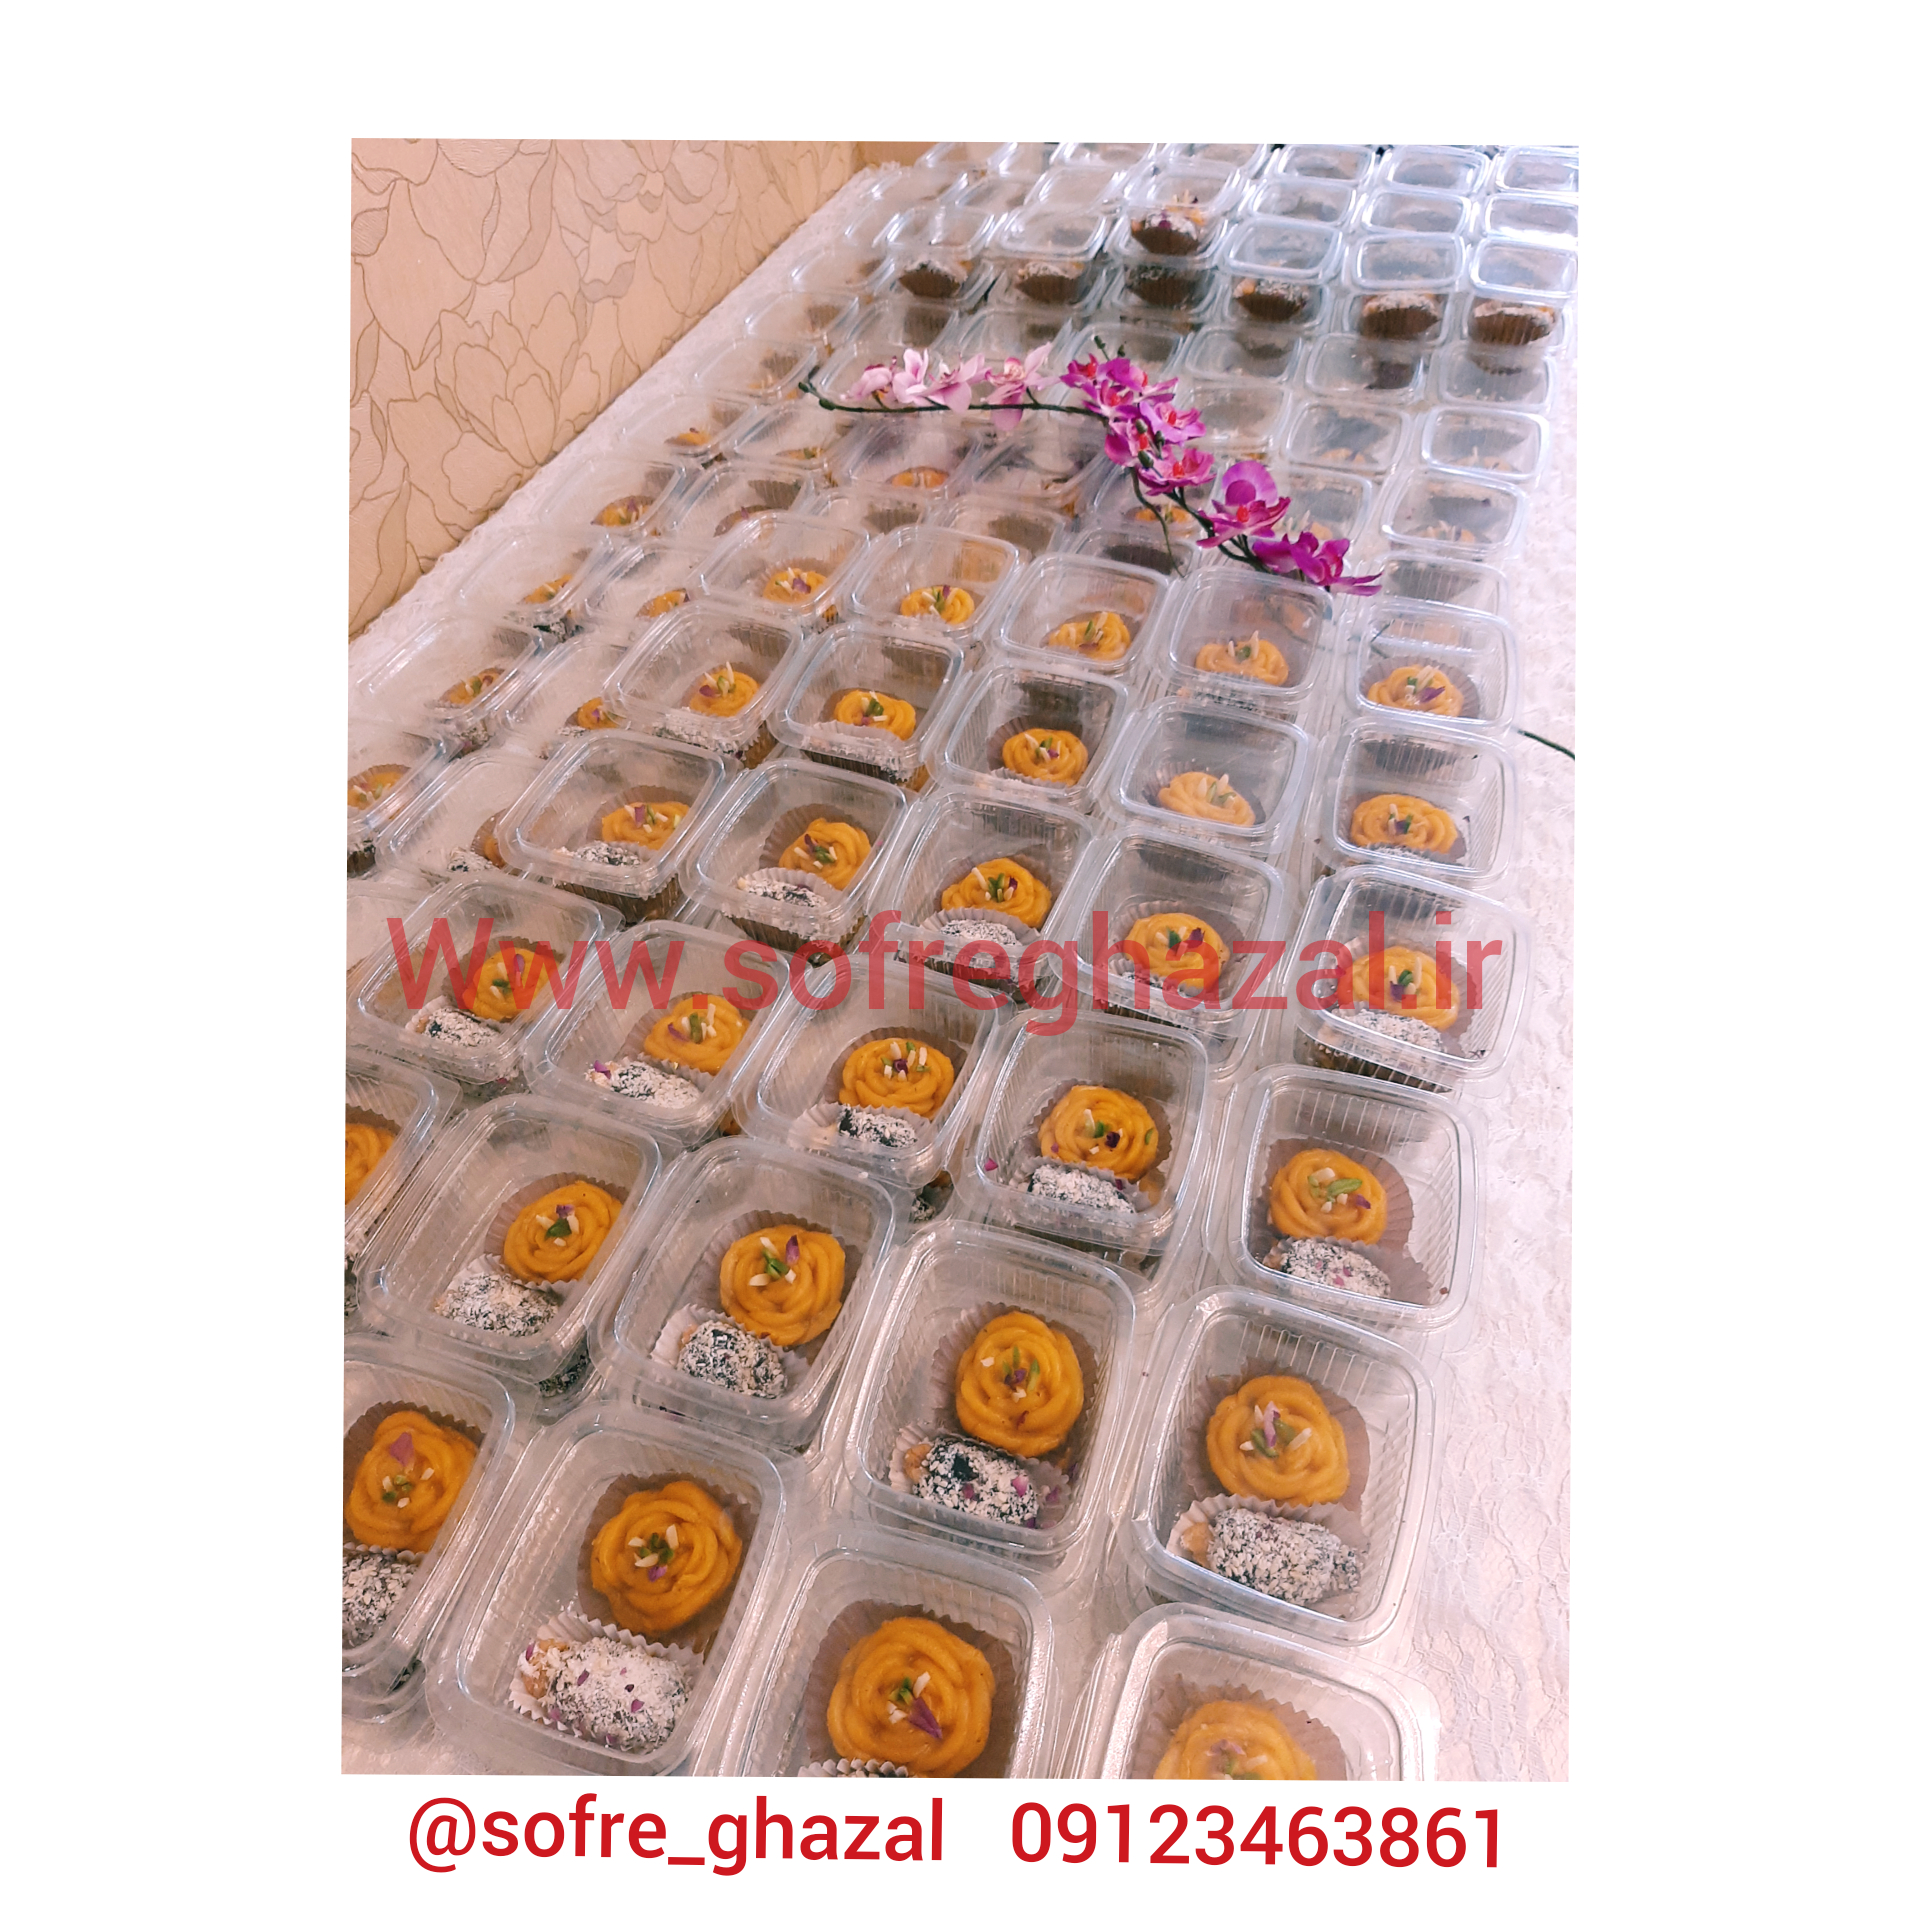 PhotoCollage_20210212_224638406